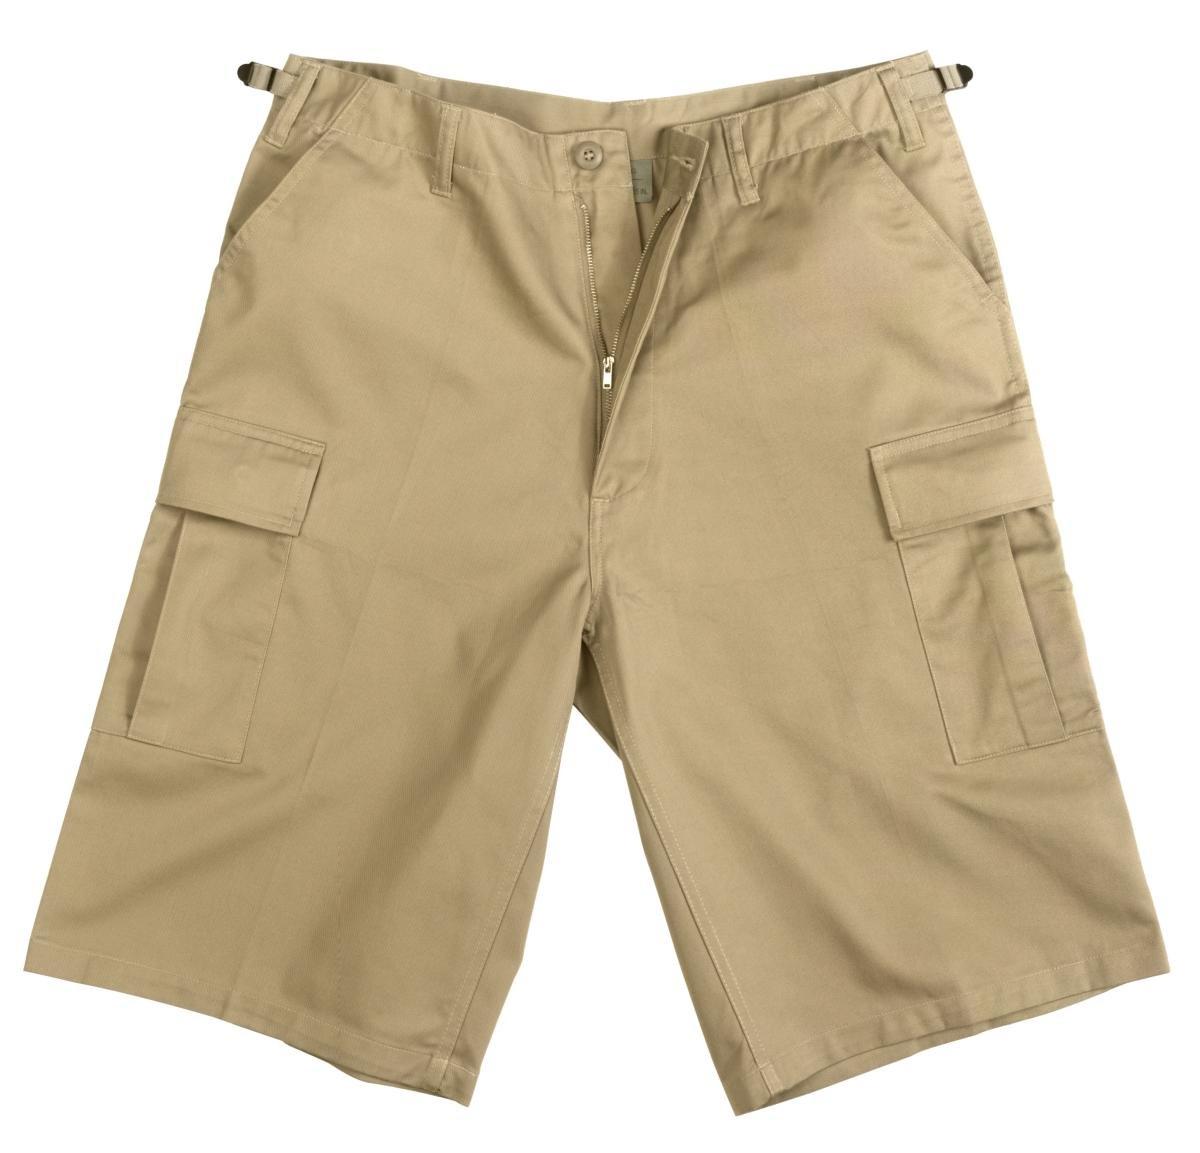 Rothco Longer Style Bdu Short - Khaki, Small